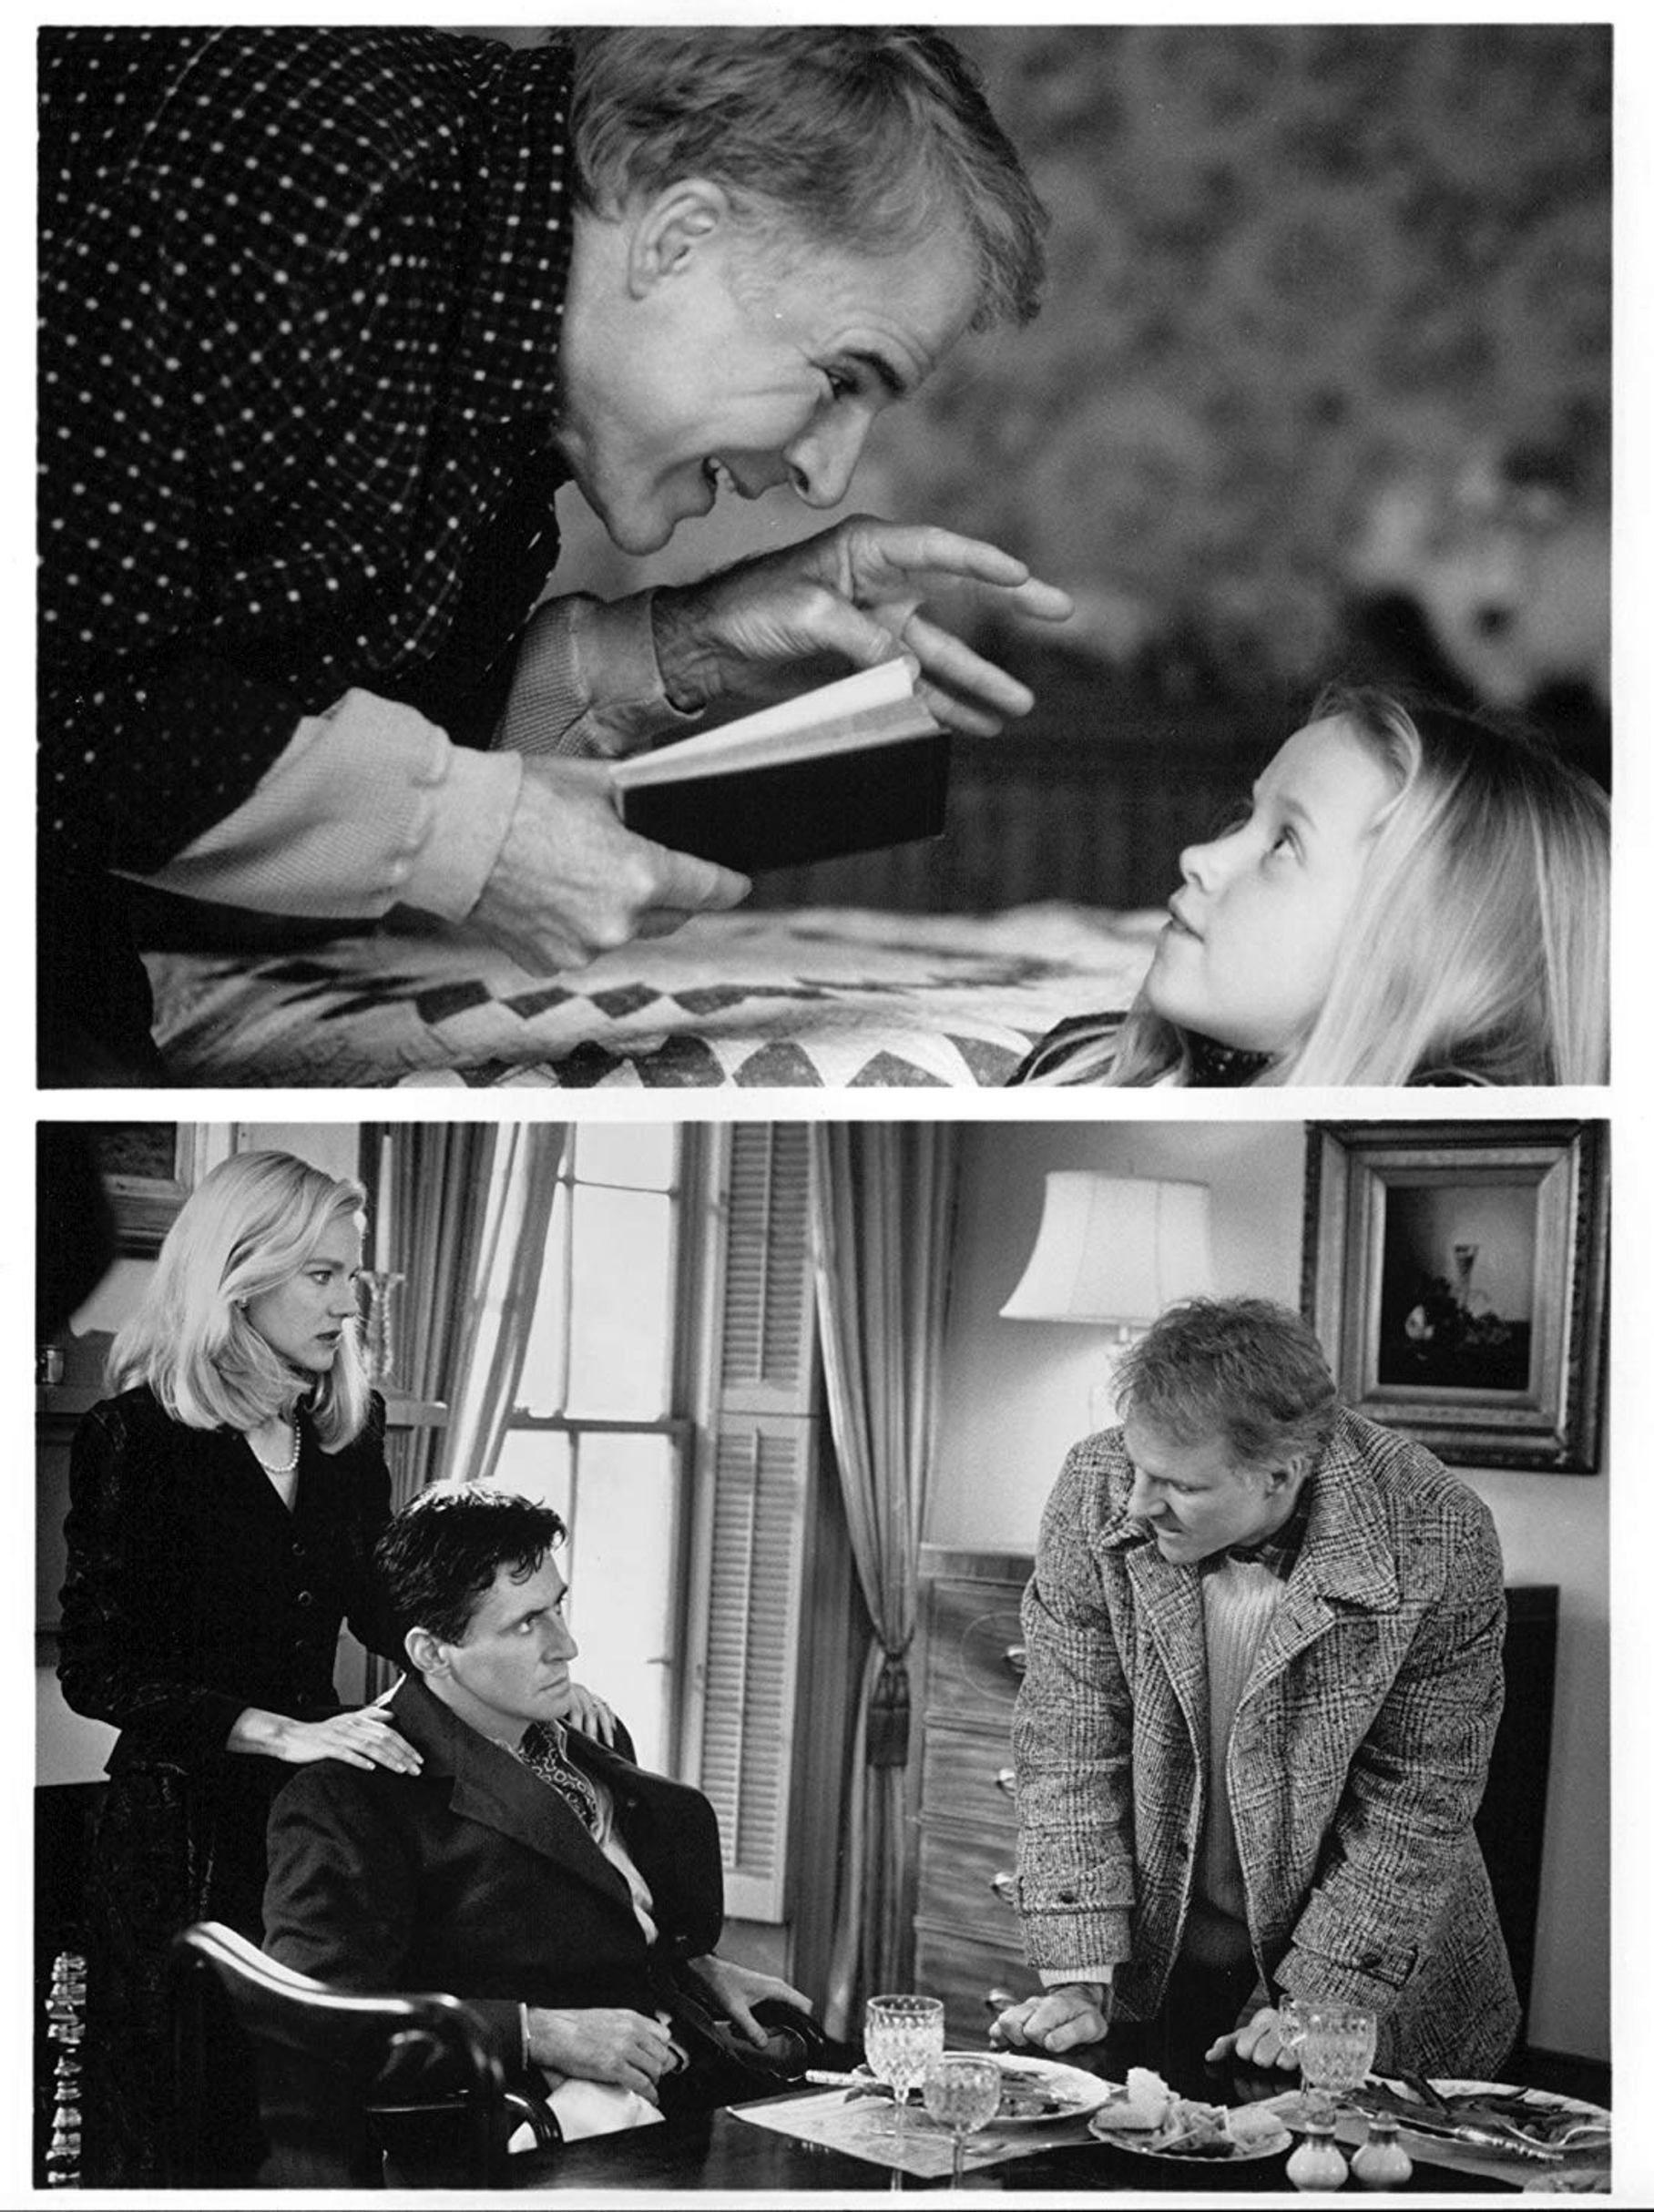 """A Simple Twist of Fate"" movie still, 1994. Top photo (L"